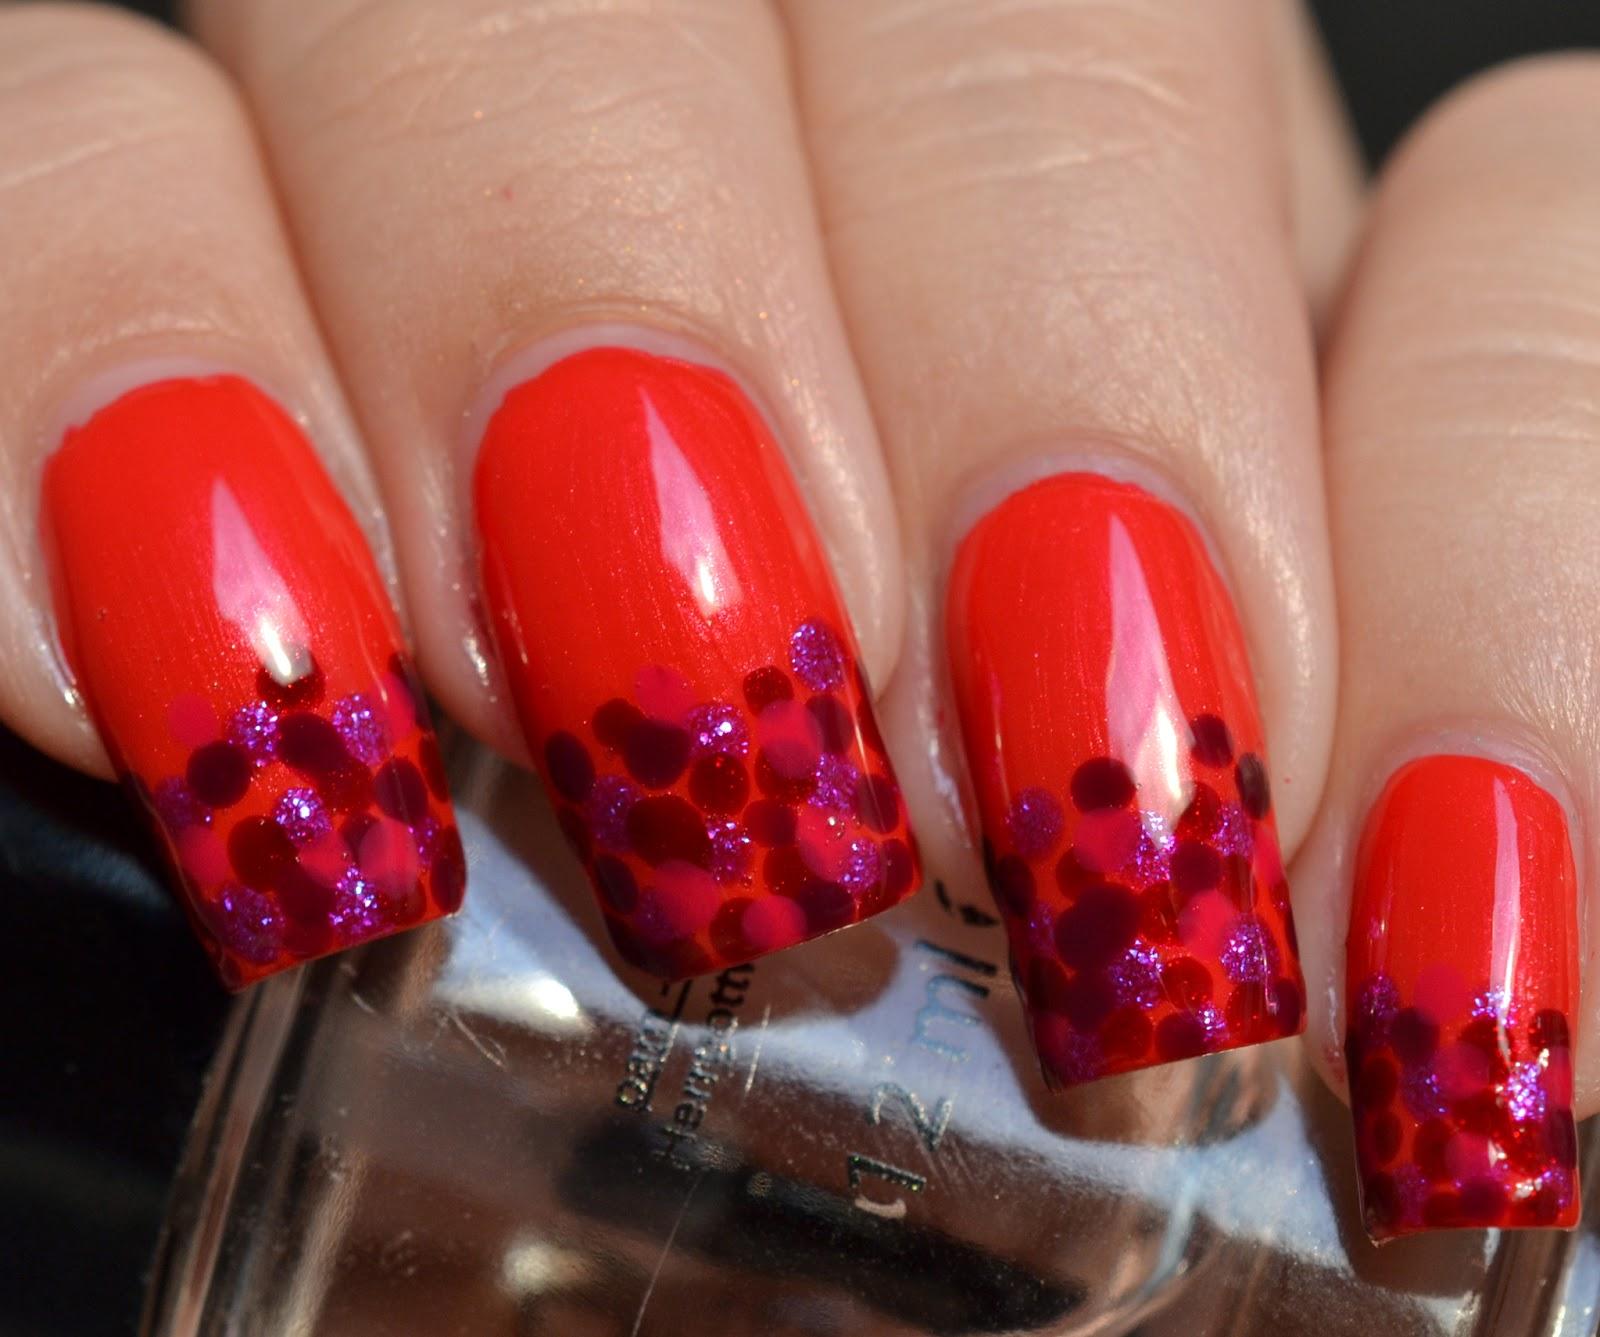 http://lenas-sofa.blogspot.de/2014/09/max-factor-gel-shine-lacquer-25-patent.html